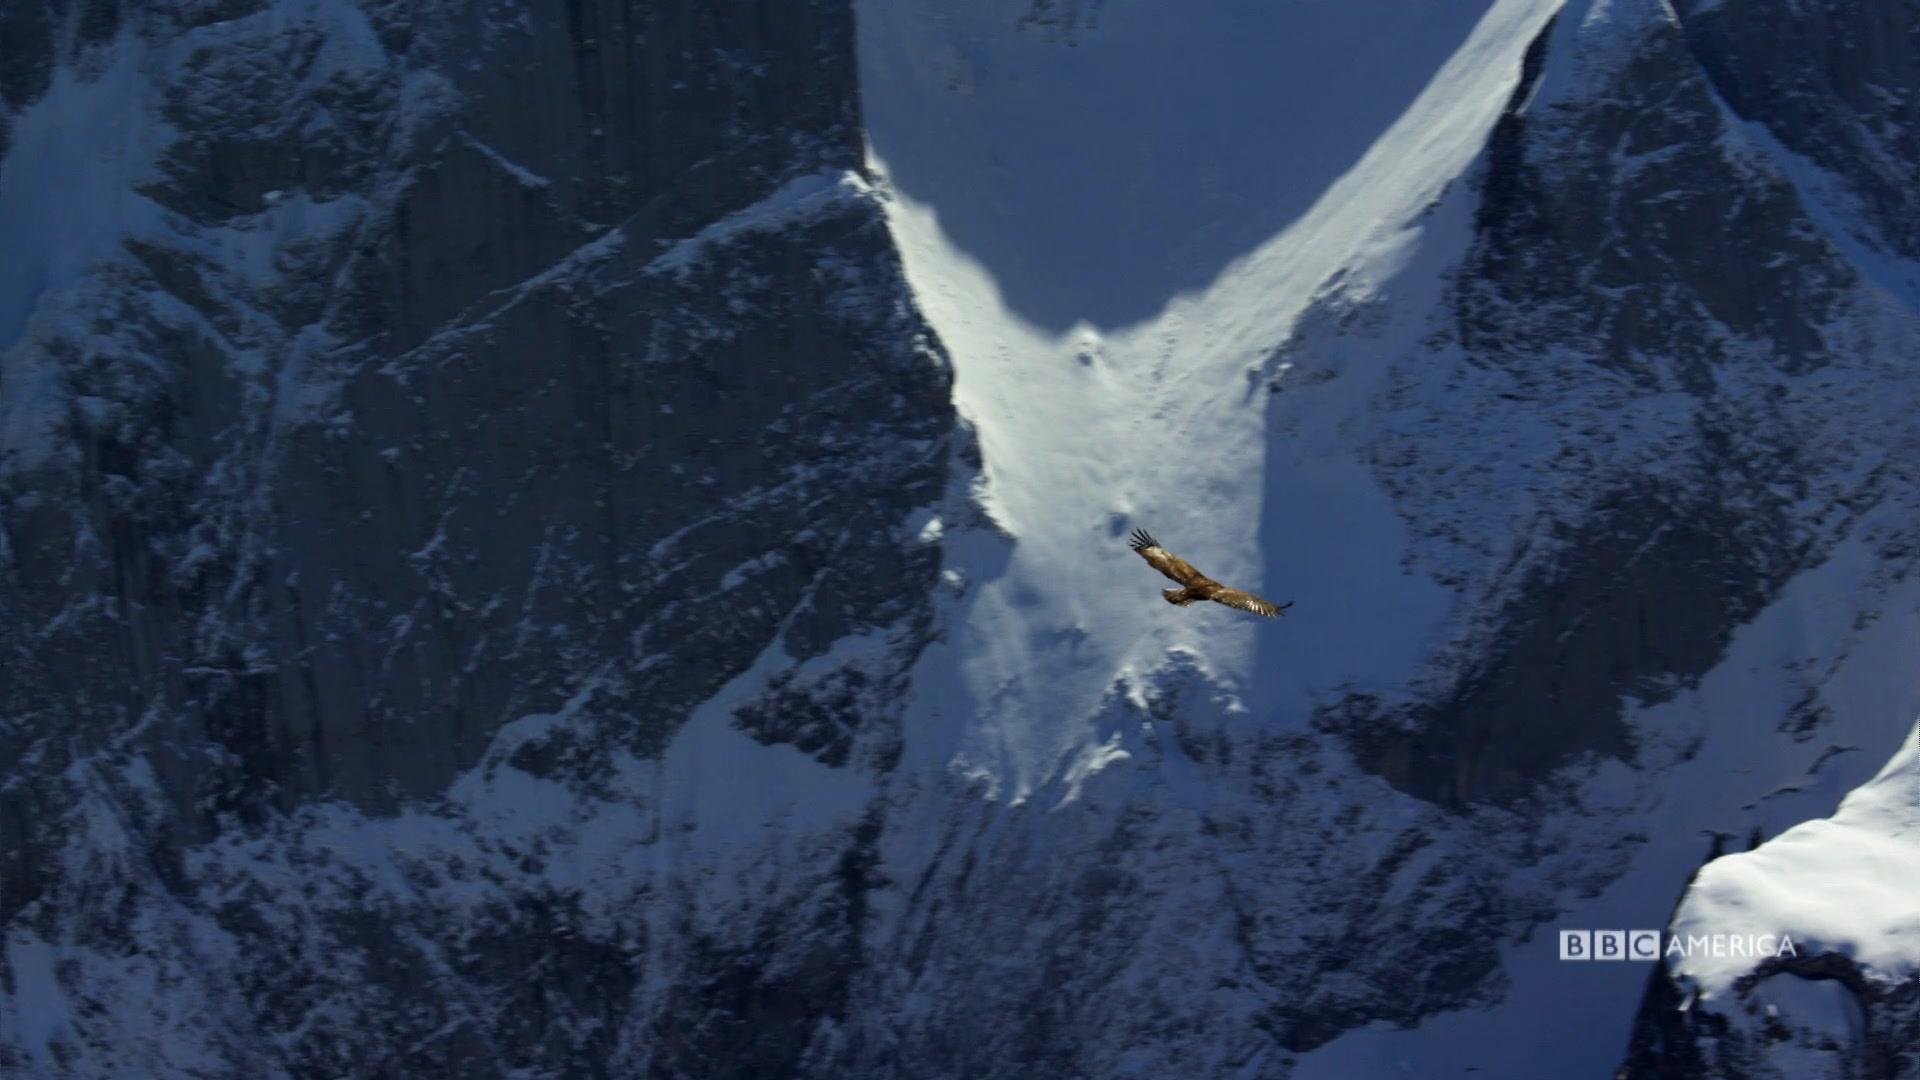 Sneak Peek Golden Eagles In The Alps